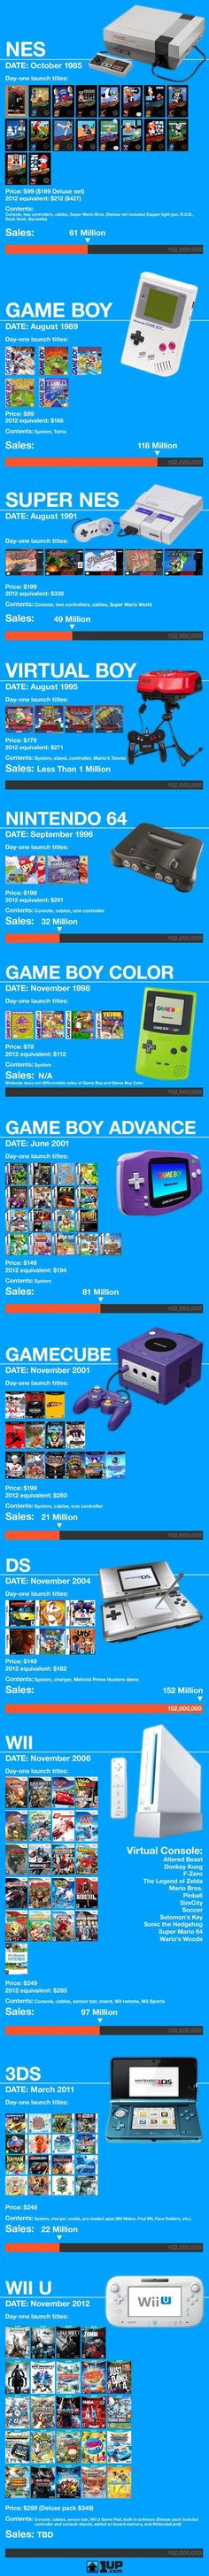 Evolution of the NES